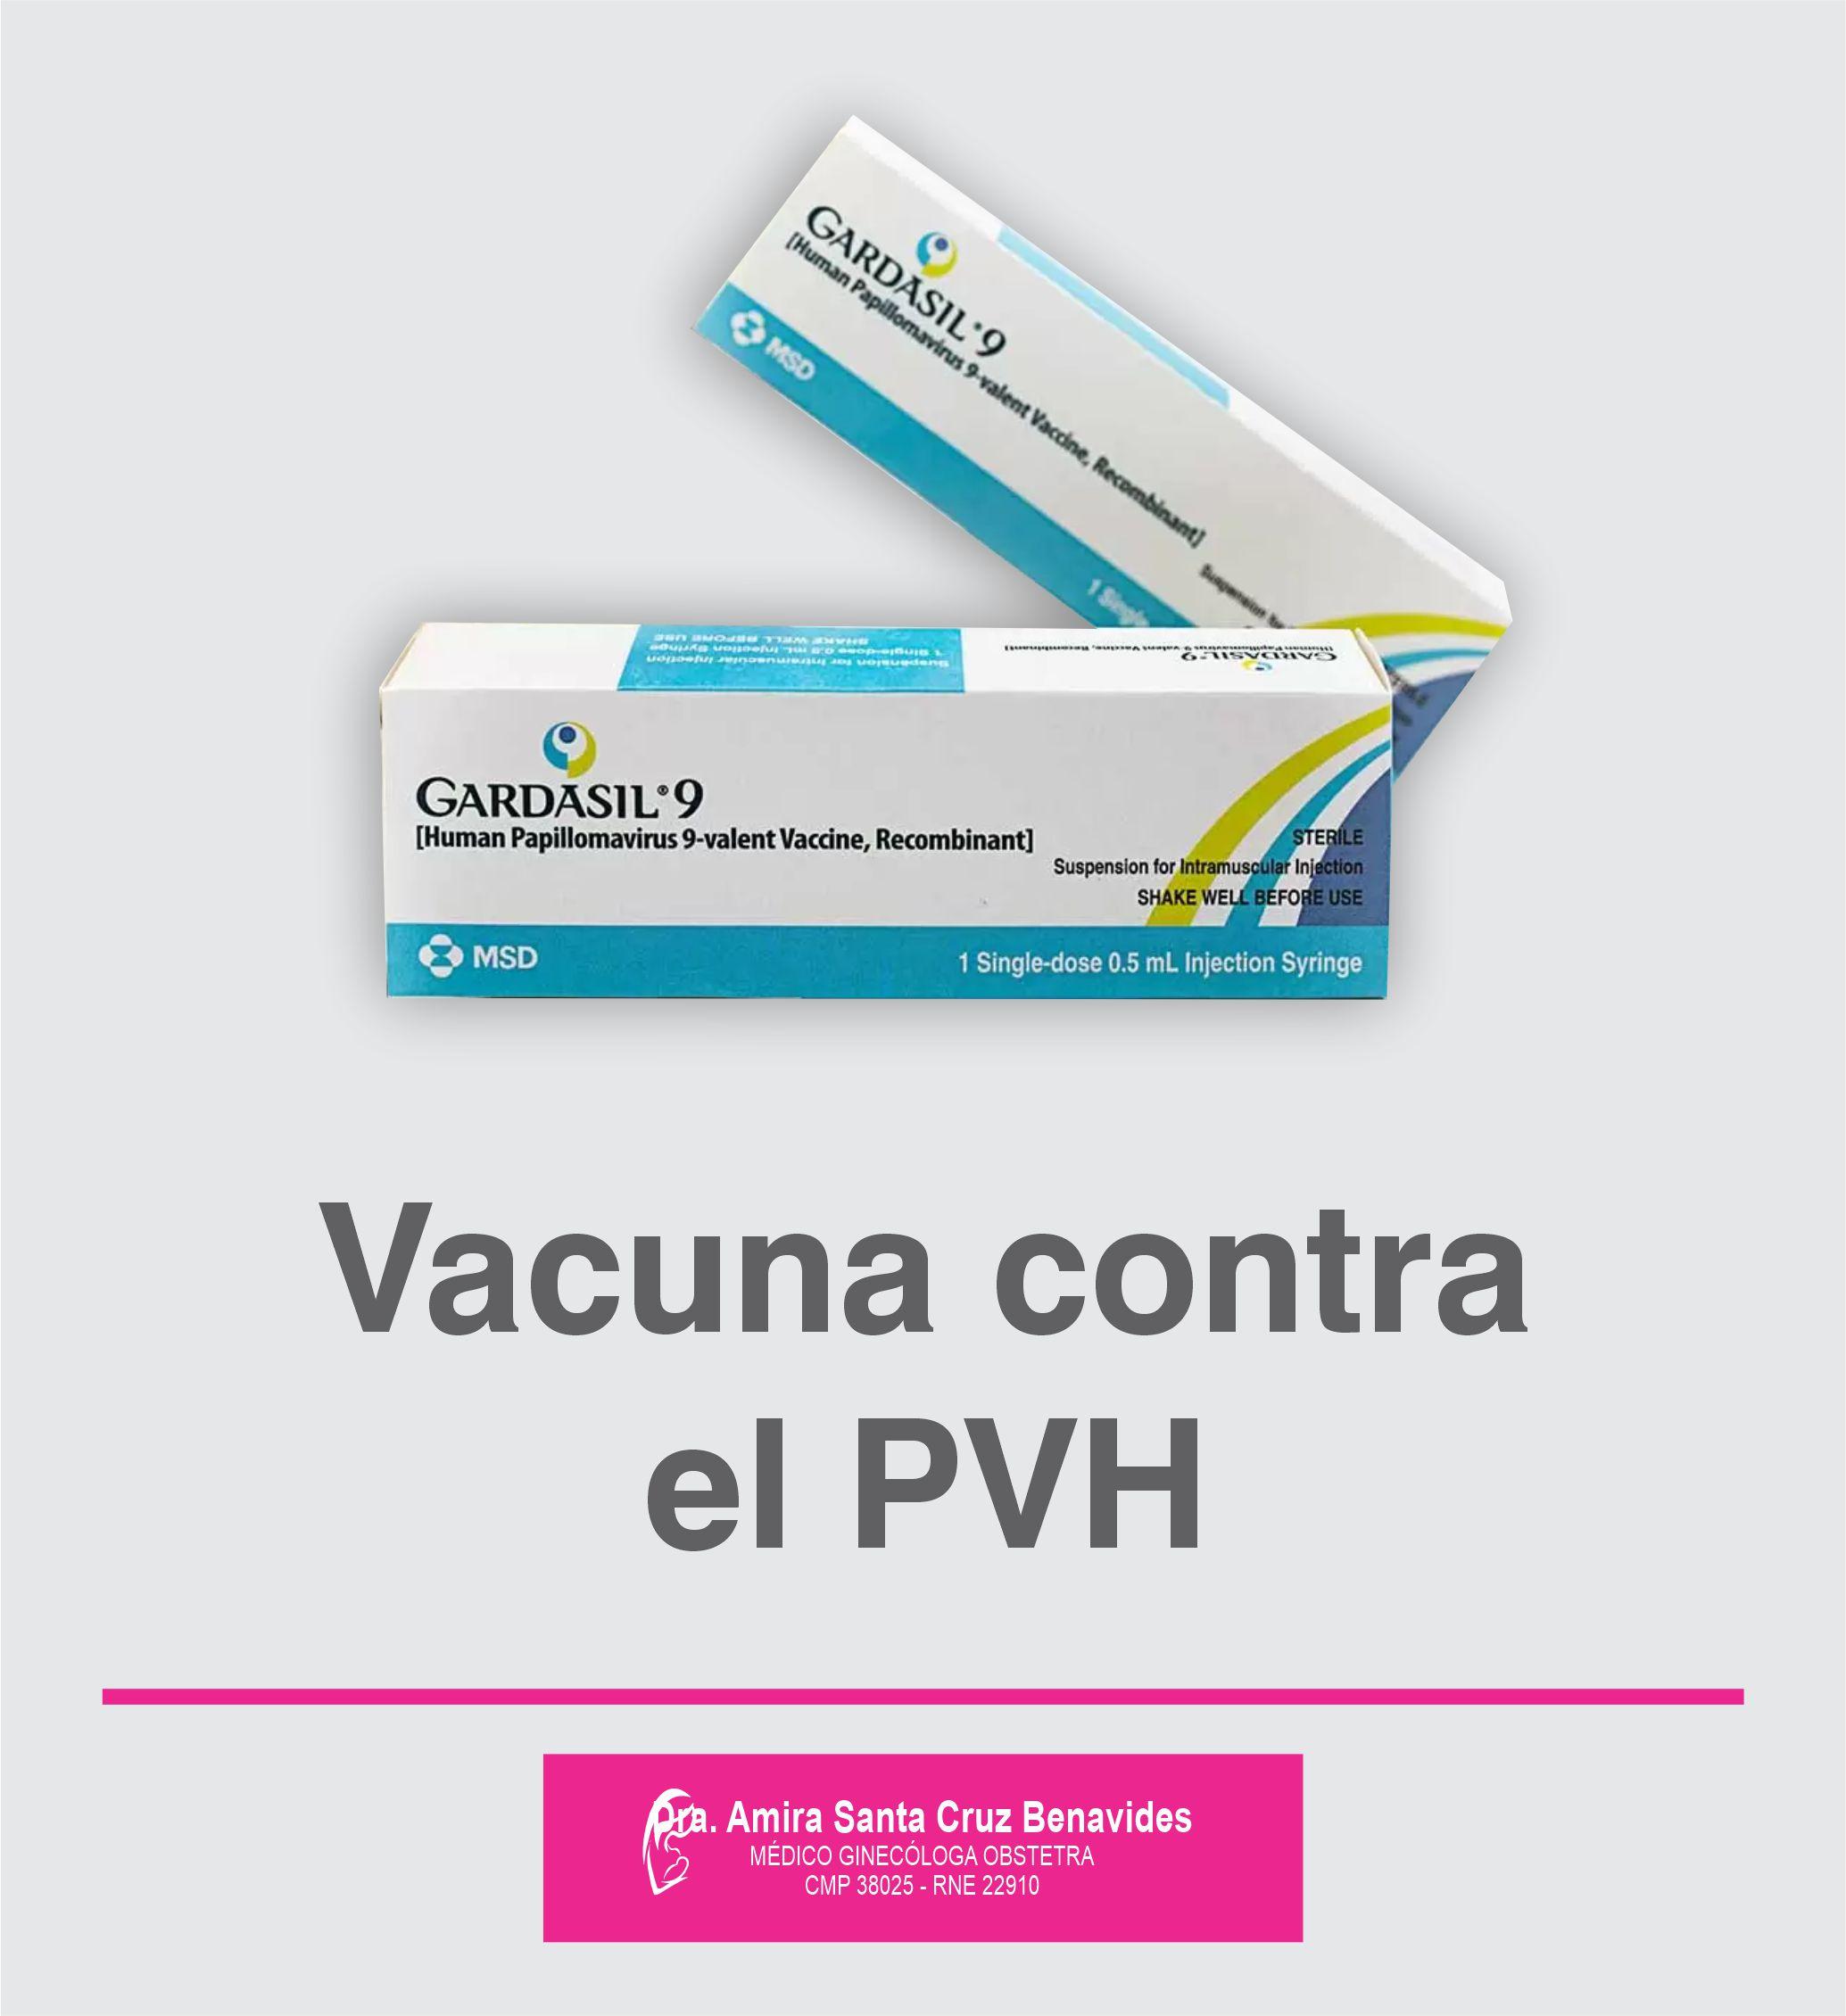 Amira Ginecologa Obstetra - Vacuna contra el PVH